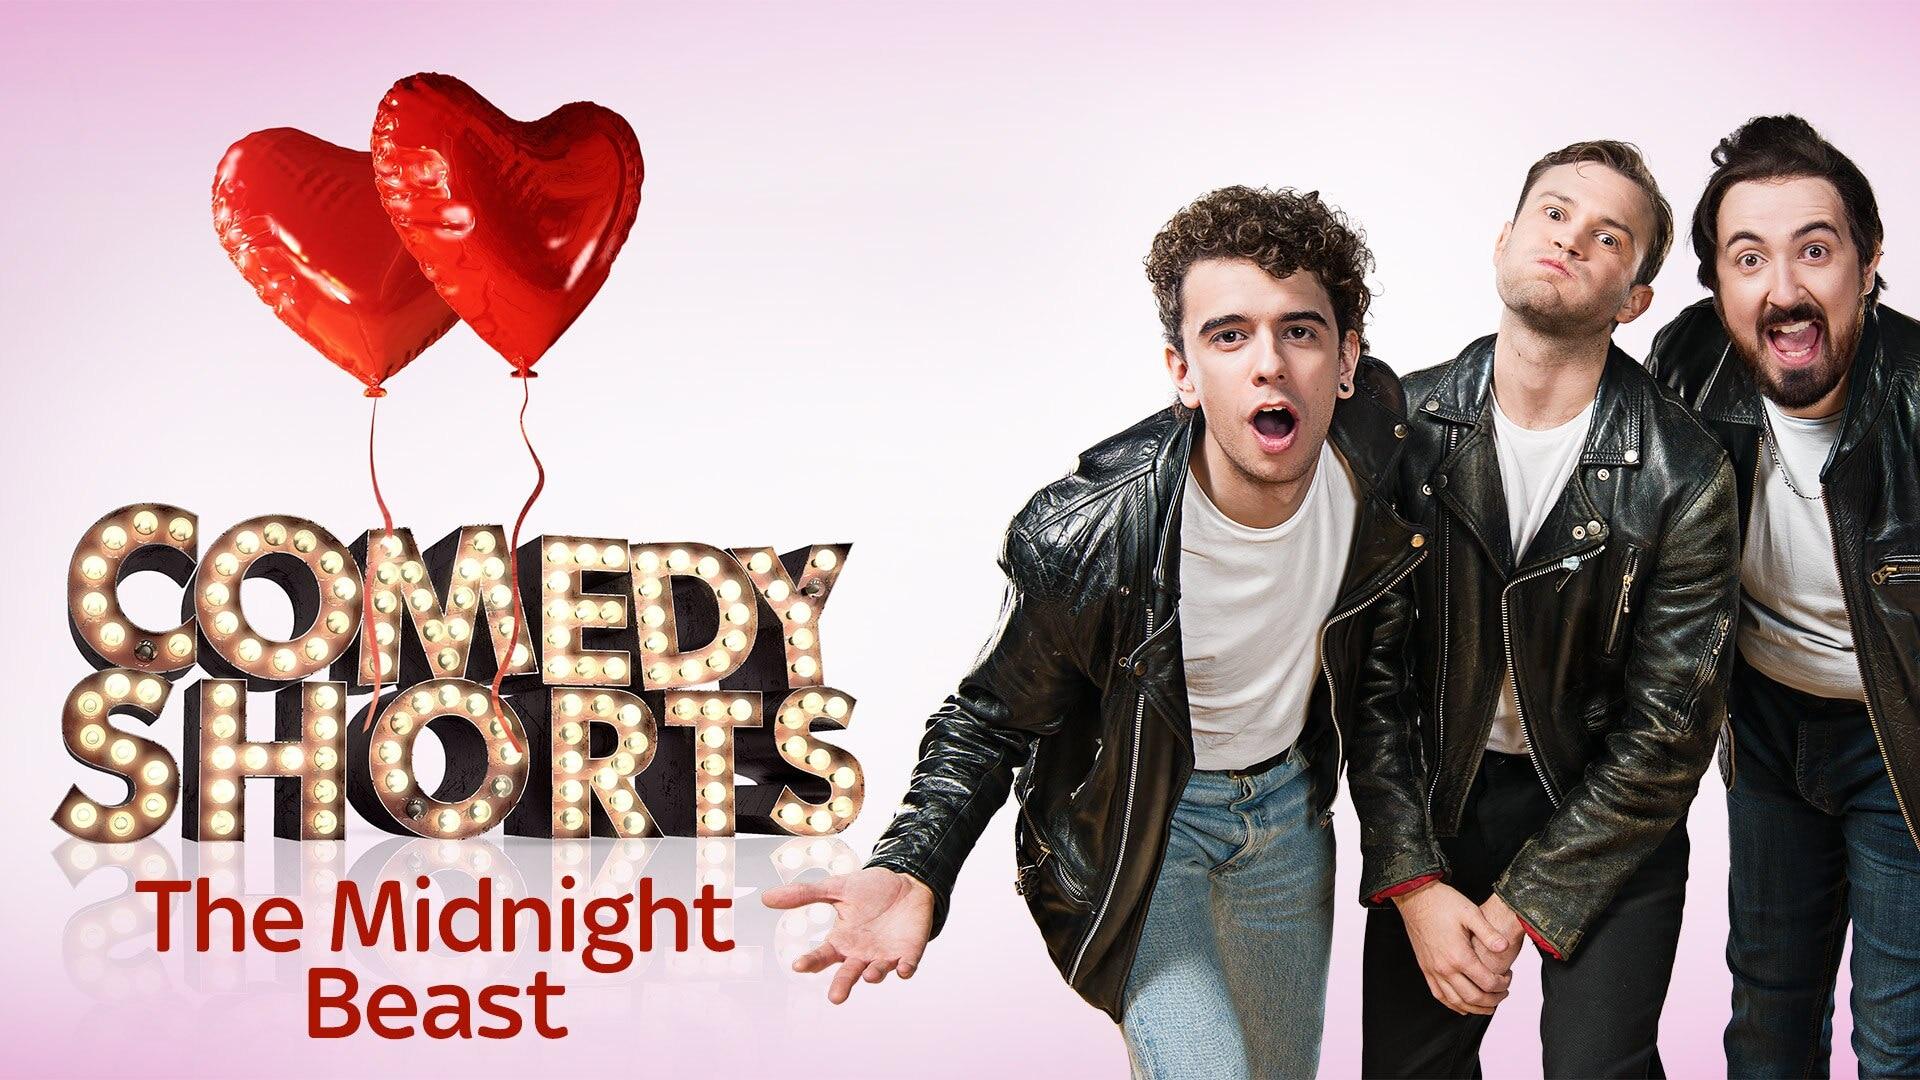 The Midnight Beast's Valentine